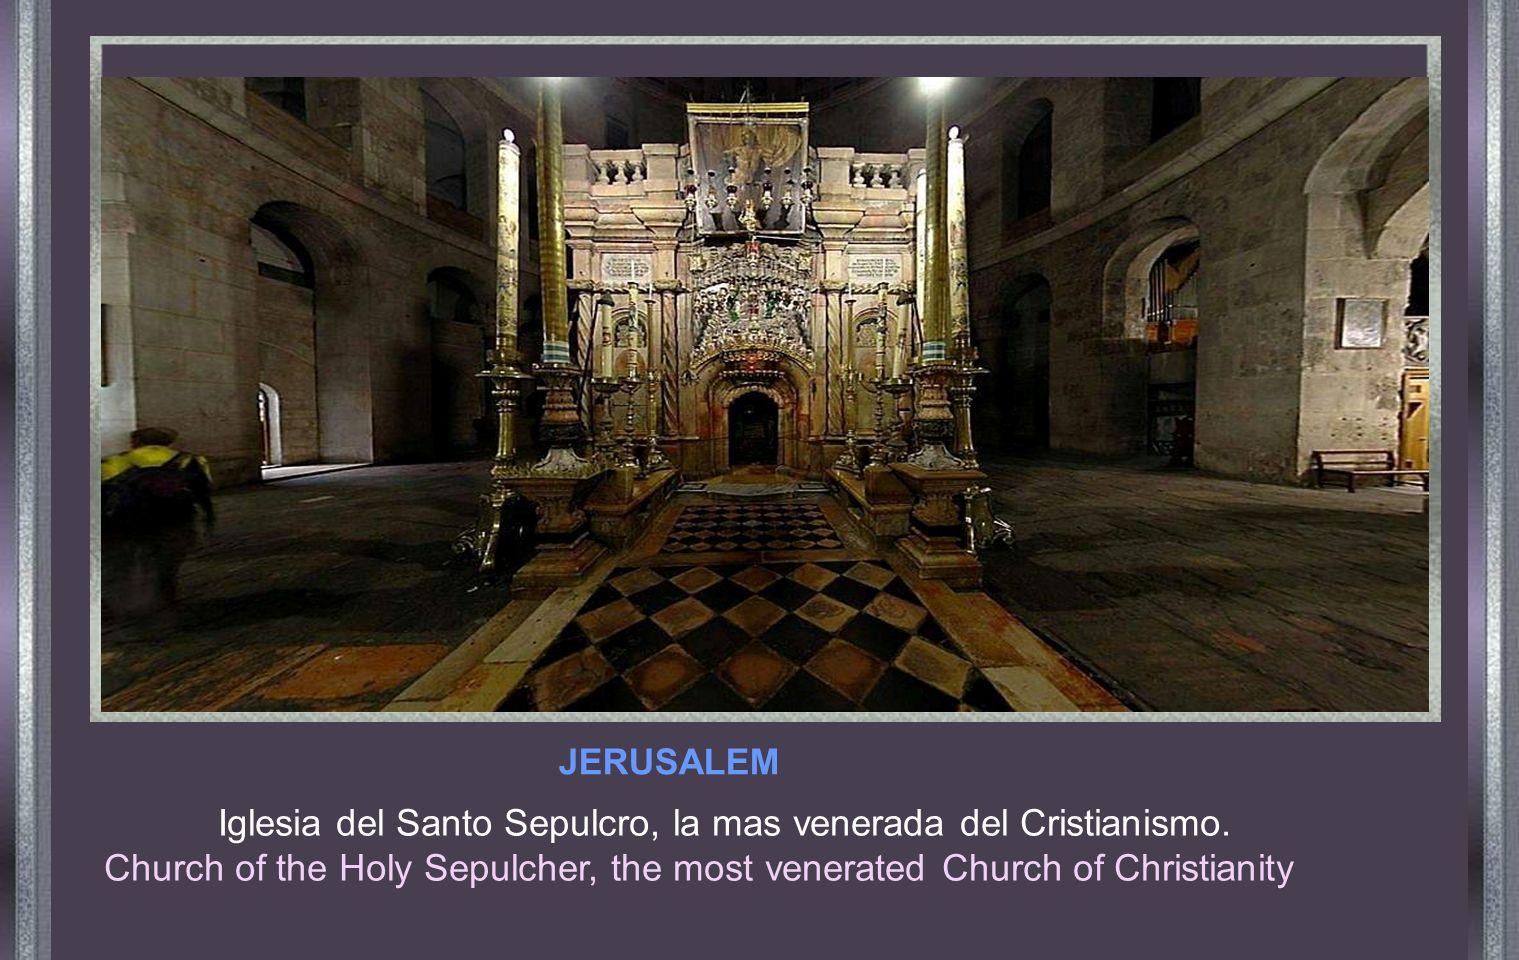 JERUSALEM Iglesia del Santo Sepulcro, la mas venerada del Cristianismo.